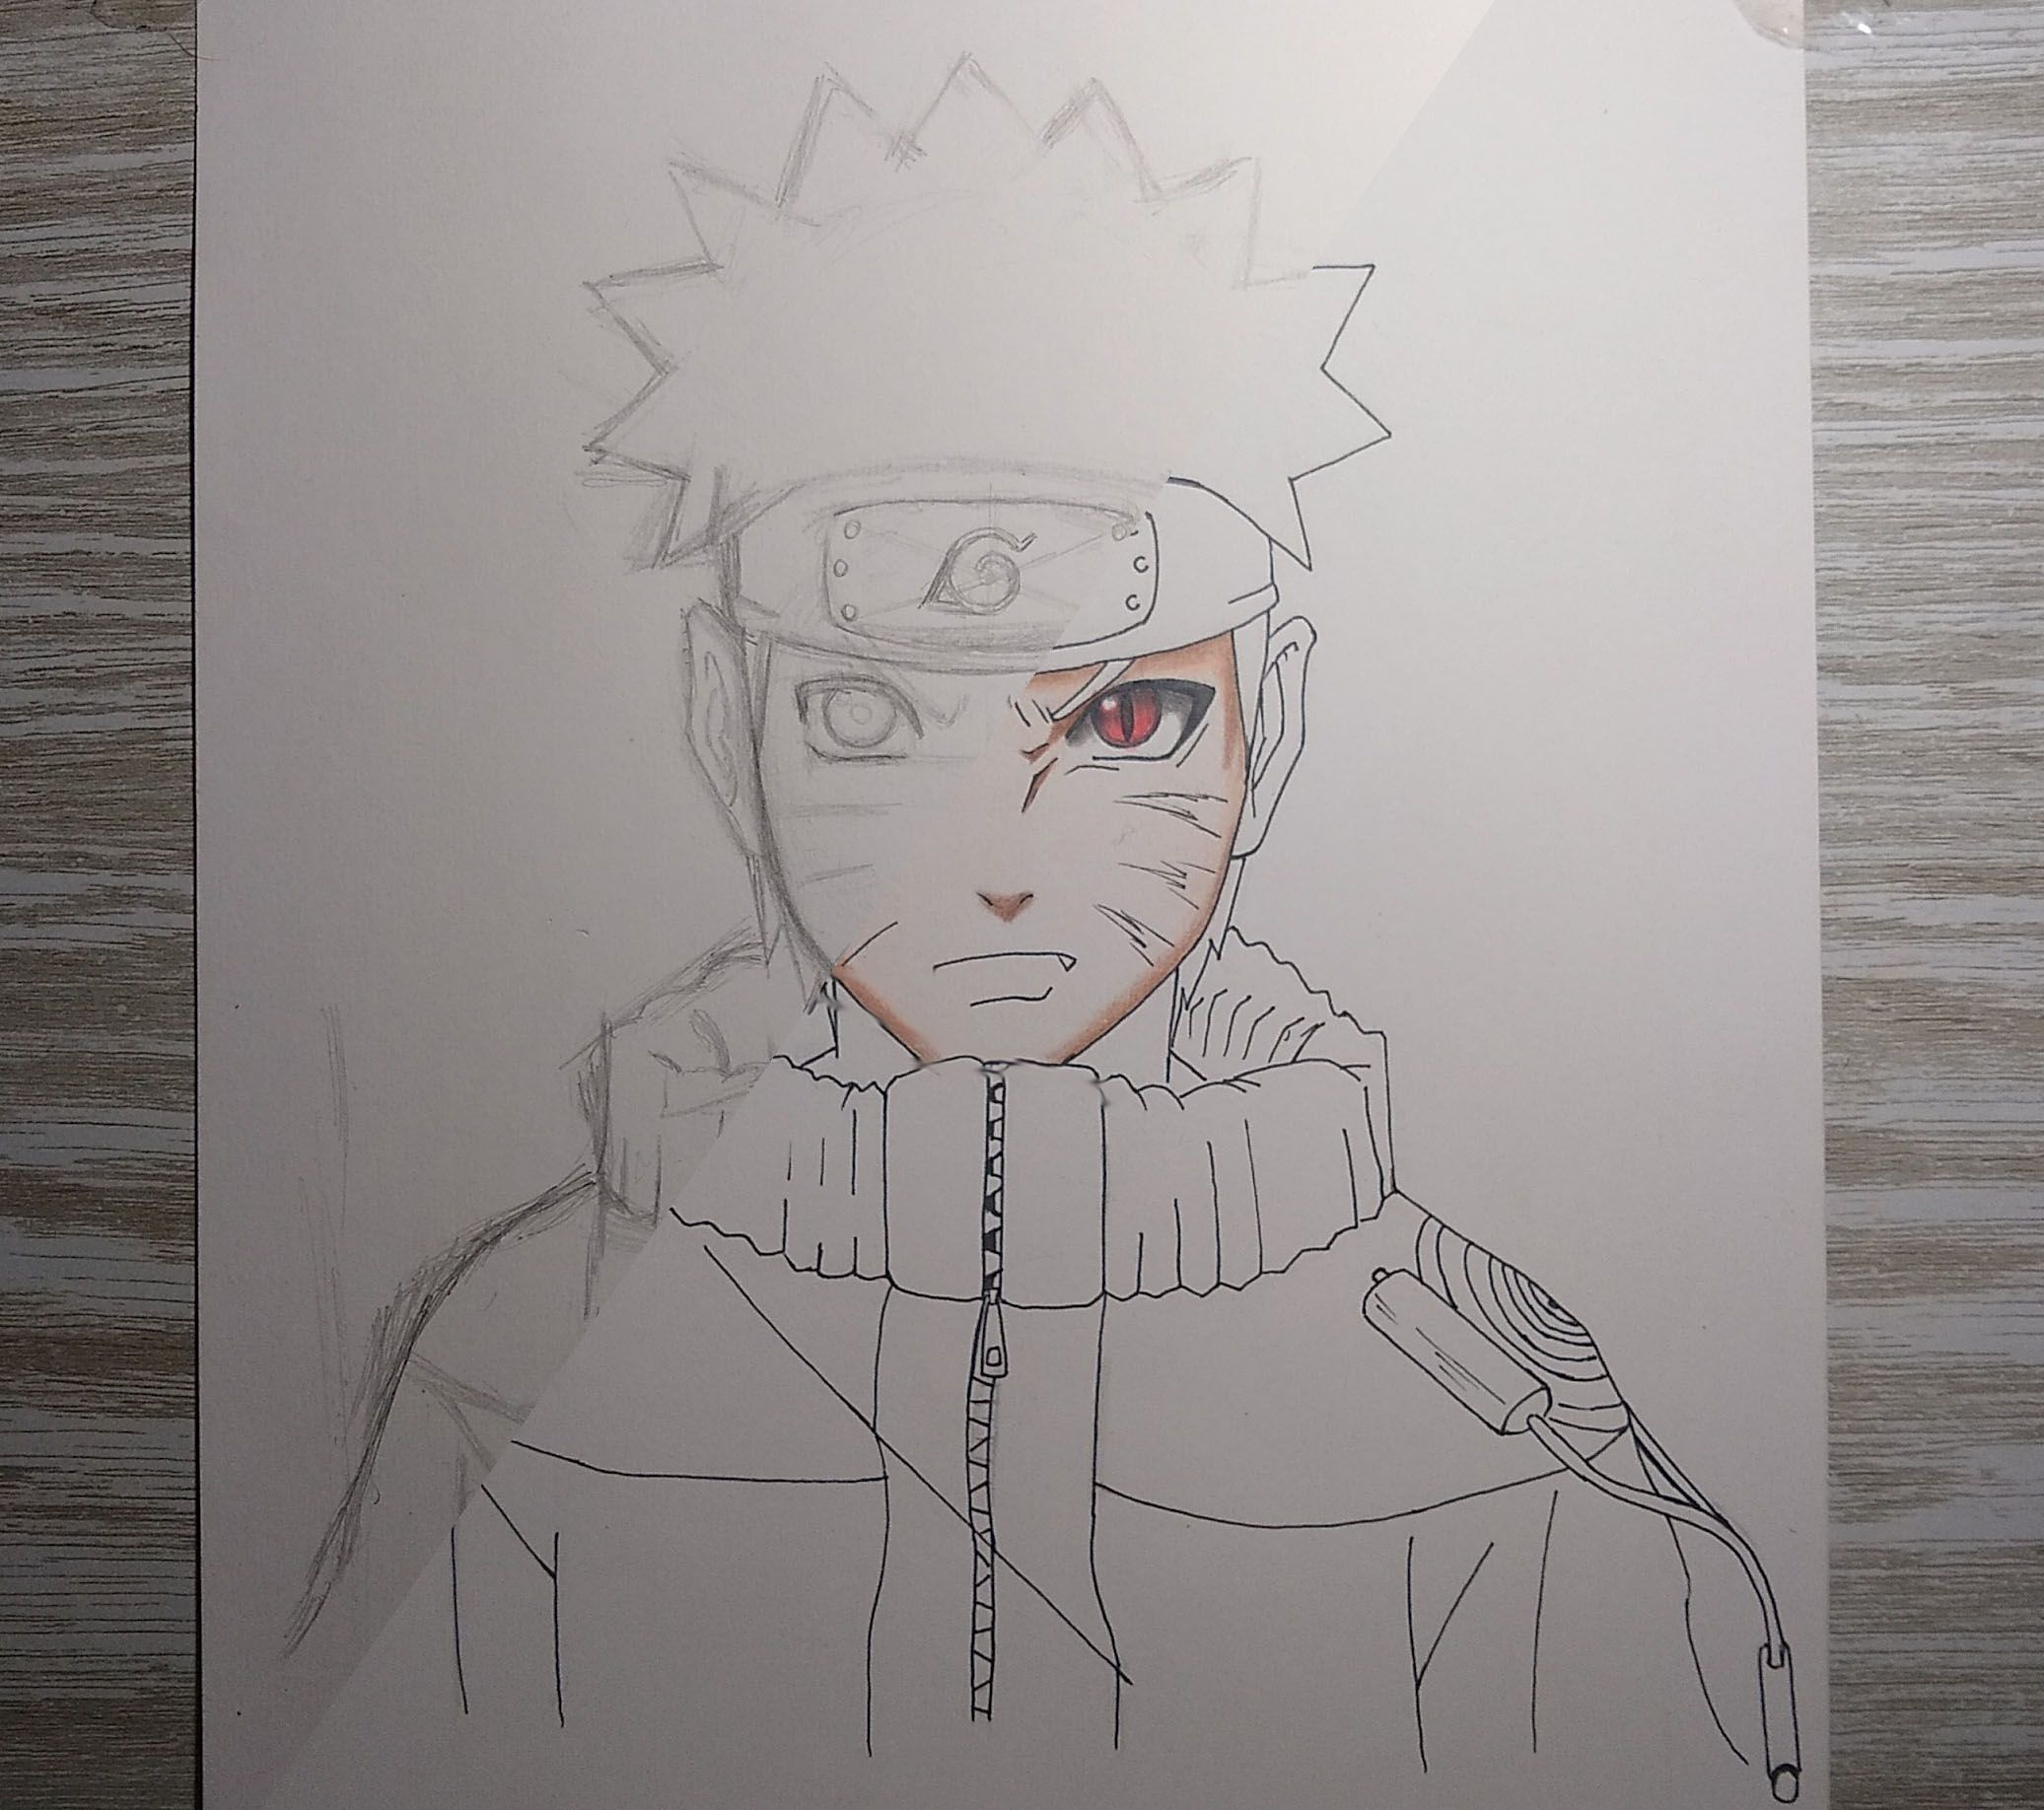 Naruto Dibujo Fácil Paso A Paso Aprender A Dibujar Dibujarte Dibujos